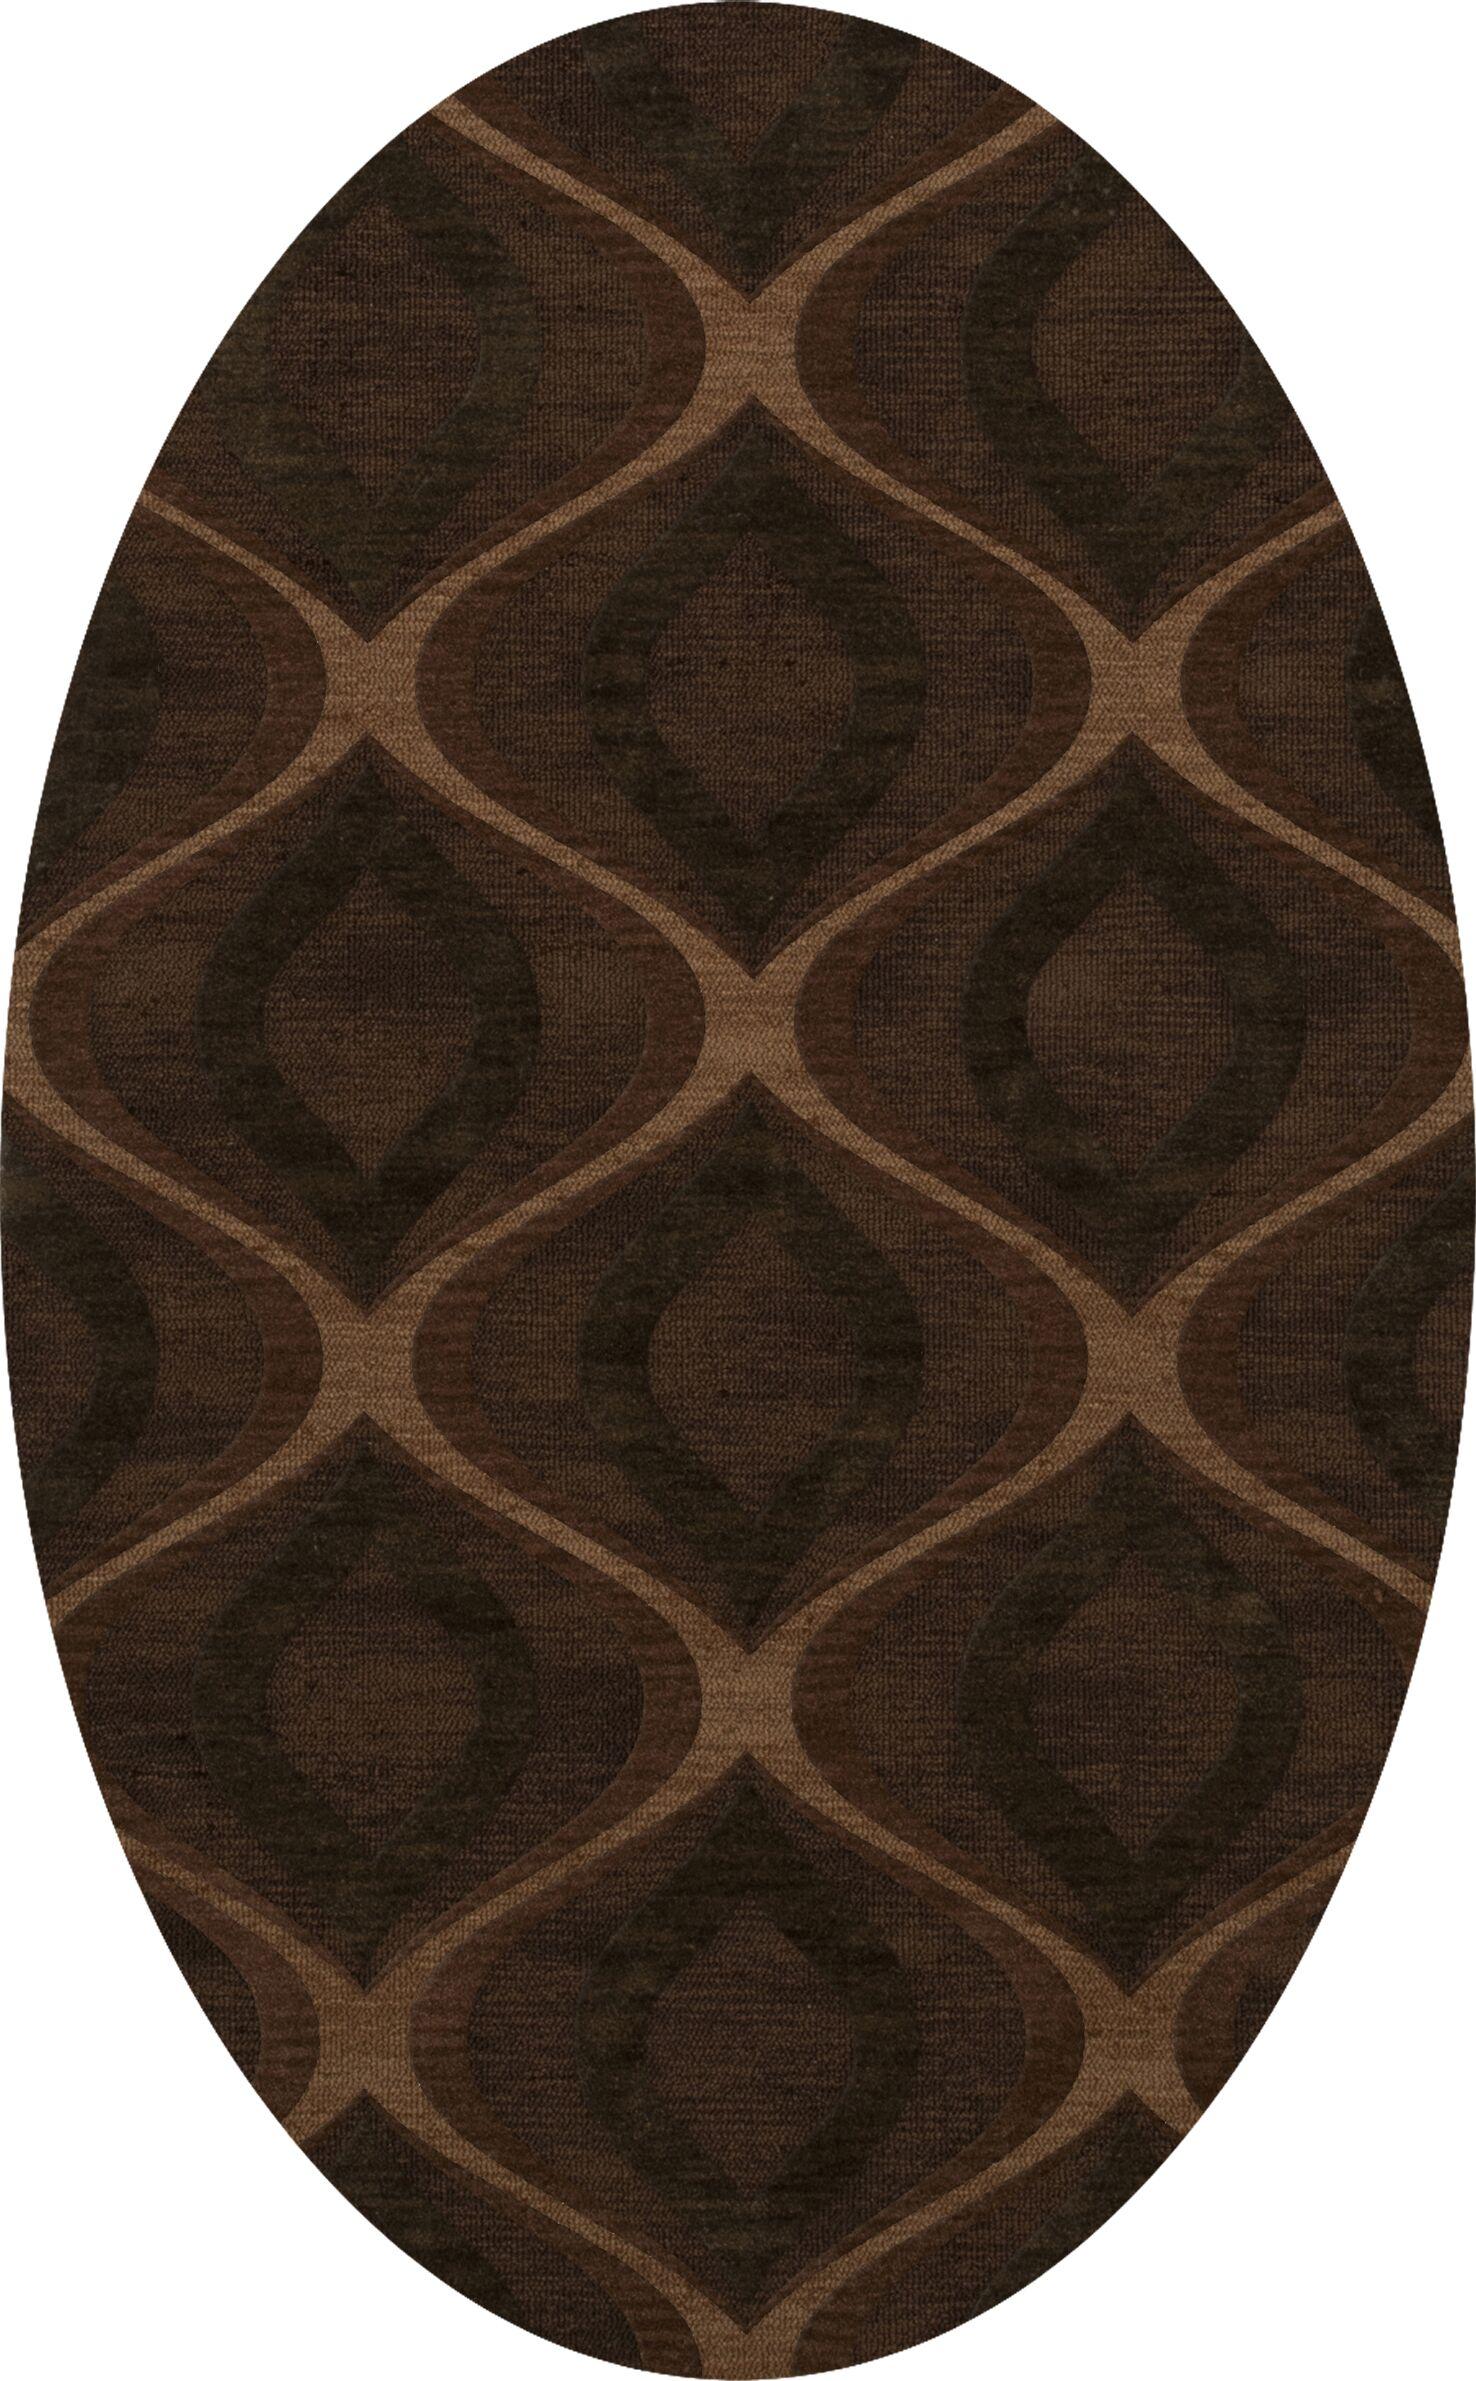 Sarahi Wool Pinecone Area Rug Rug Size: Oval 4' x 6'